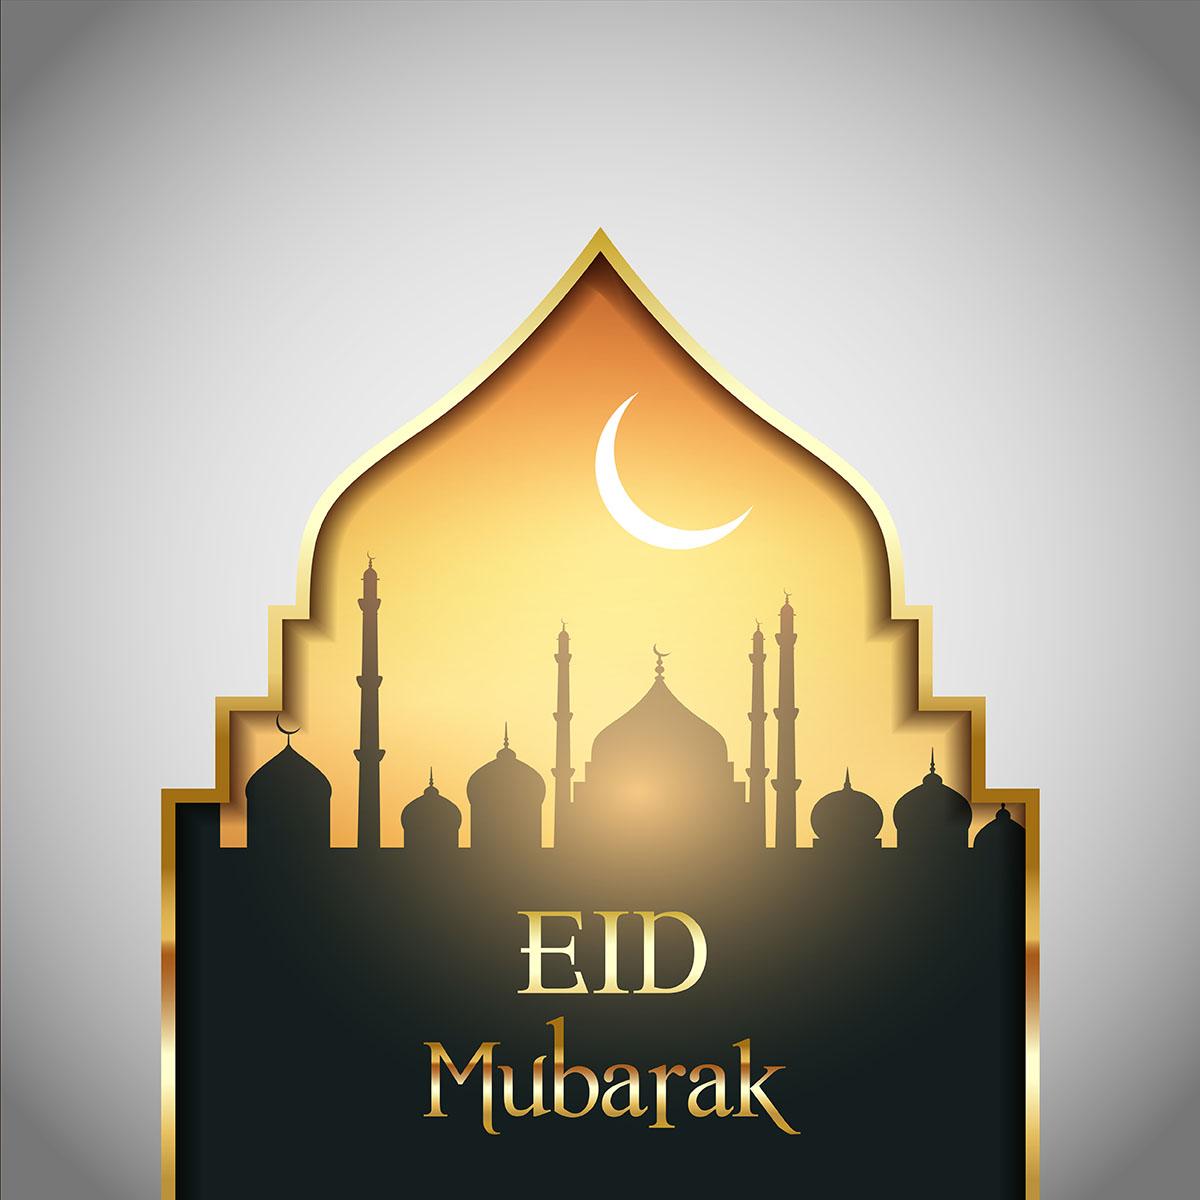 Eid Mubarak Landscape Background Download Free Vectors